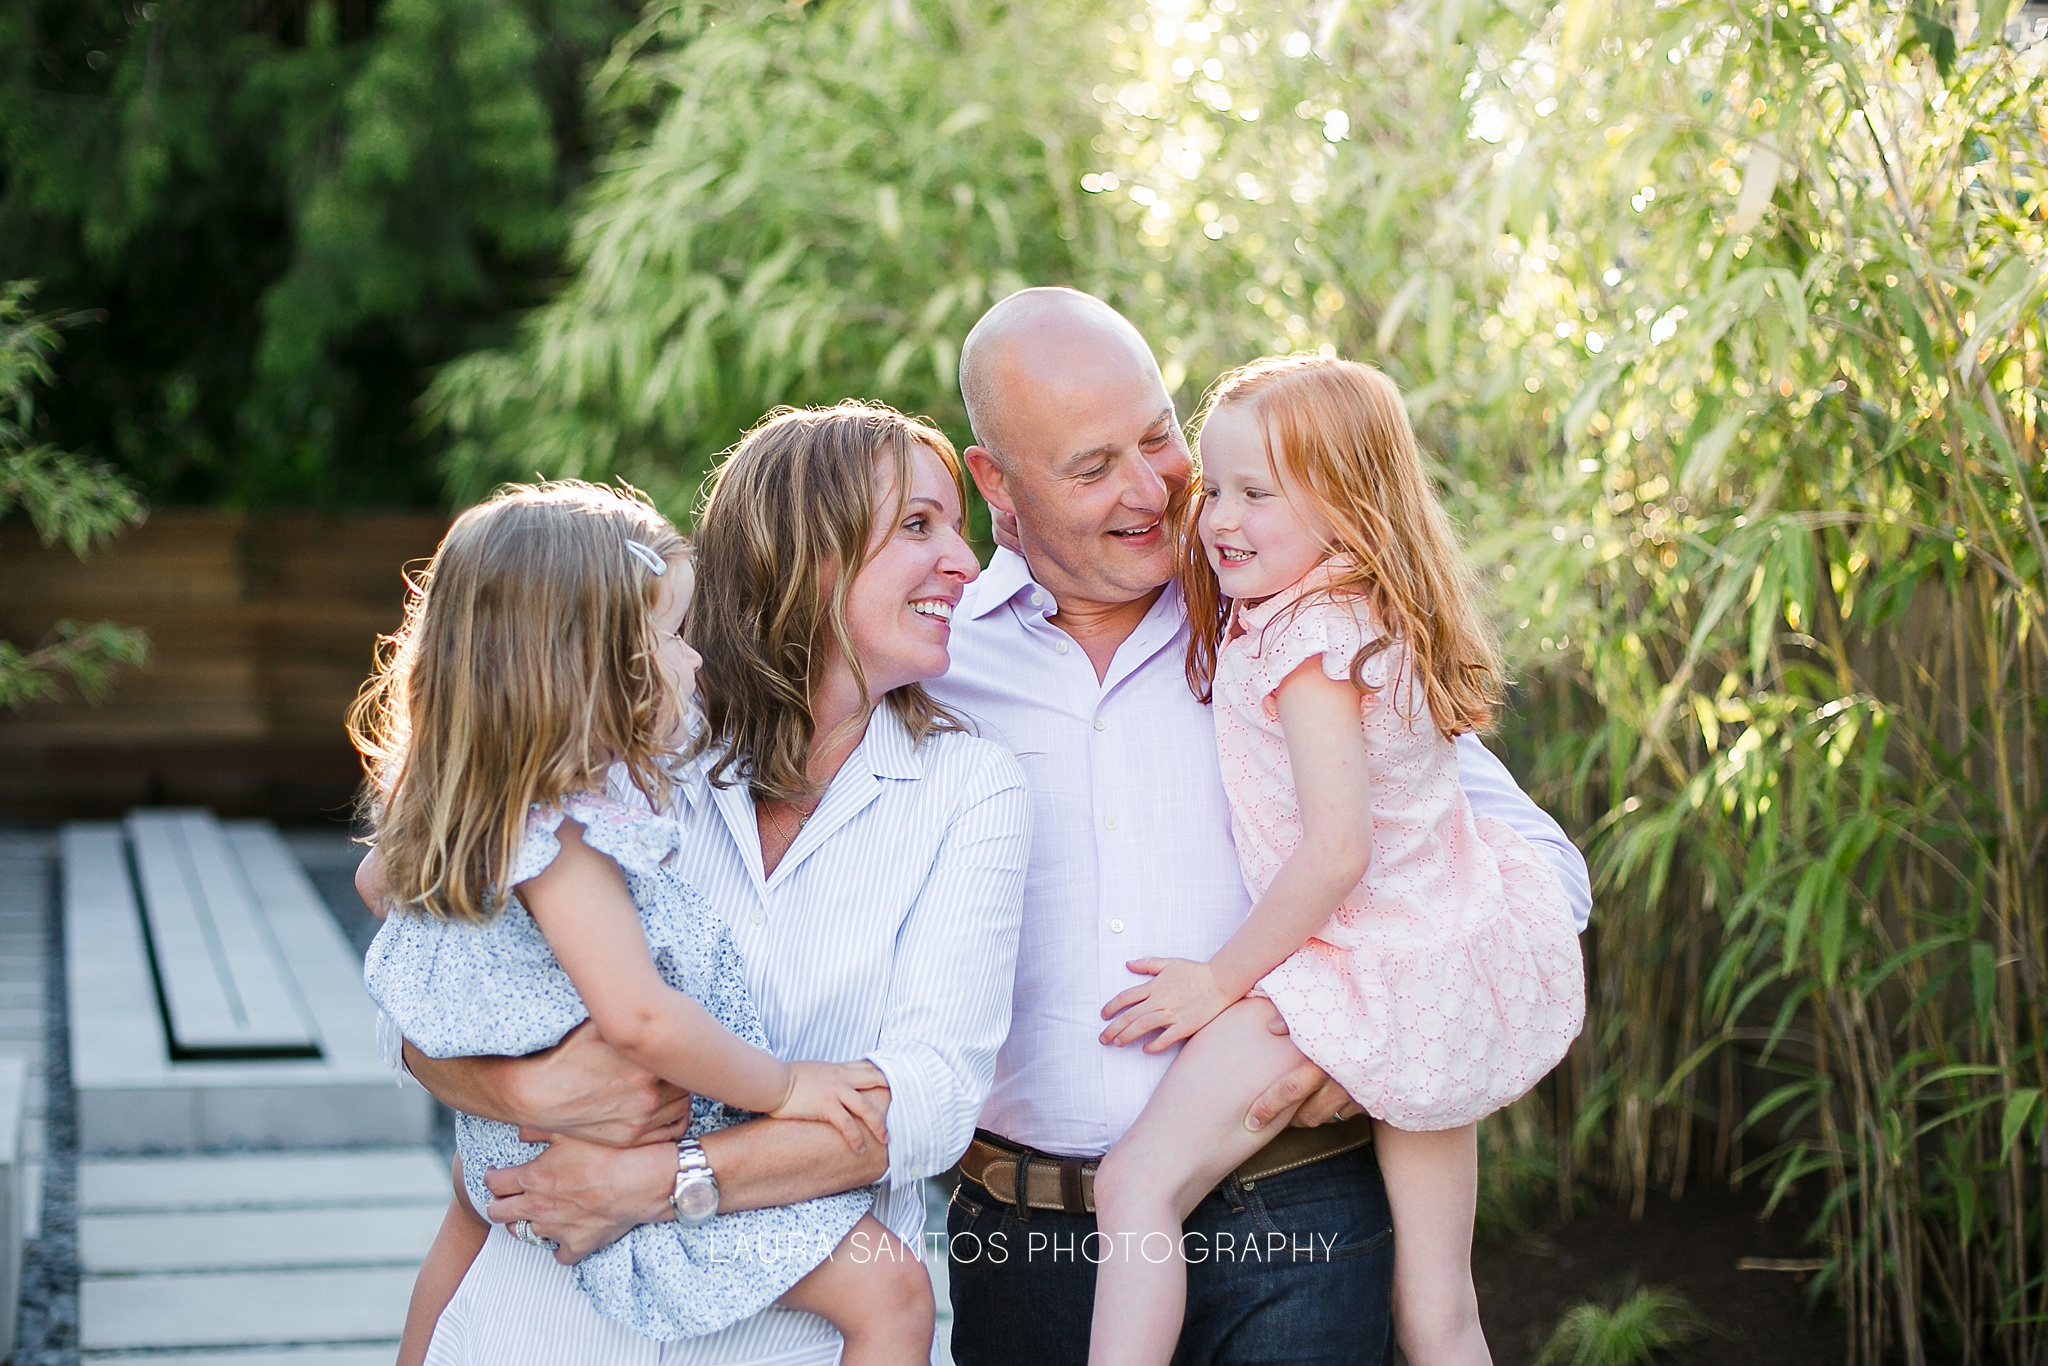 Laura Santos Photography Portland Oregon Family Photographer_0016.jpg